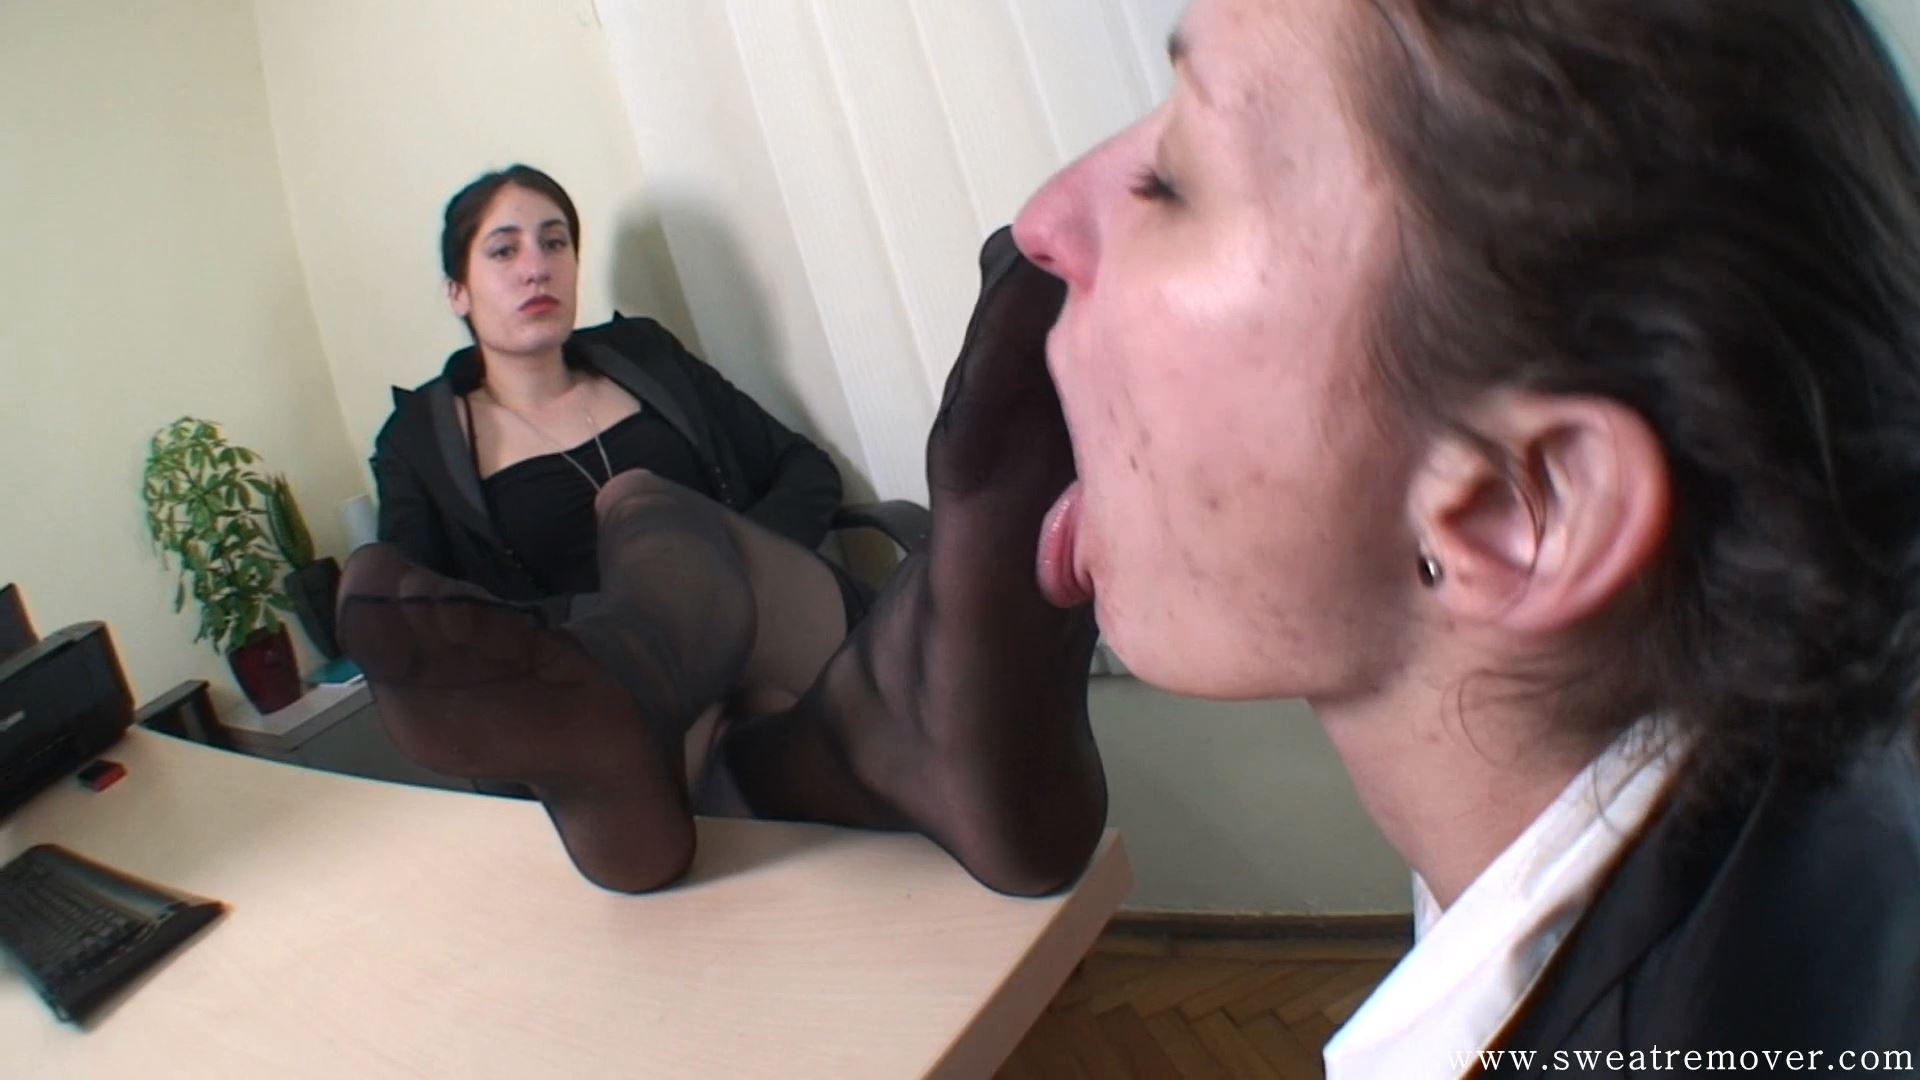 Goddess Valentine In Scene: Under the table, slave girl Part 4 - SWEATREMOVER - FULL HD/1080p/MP4